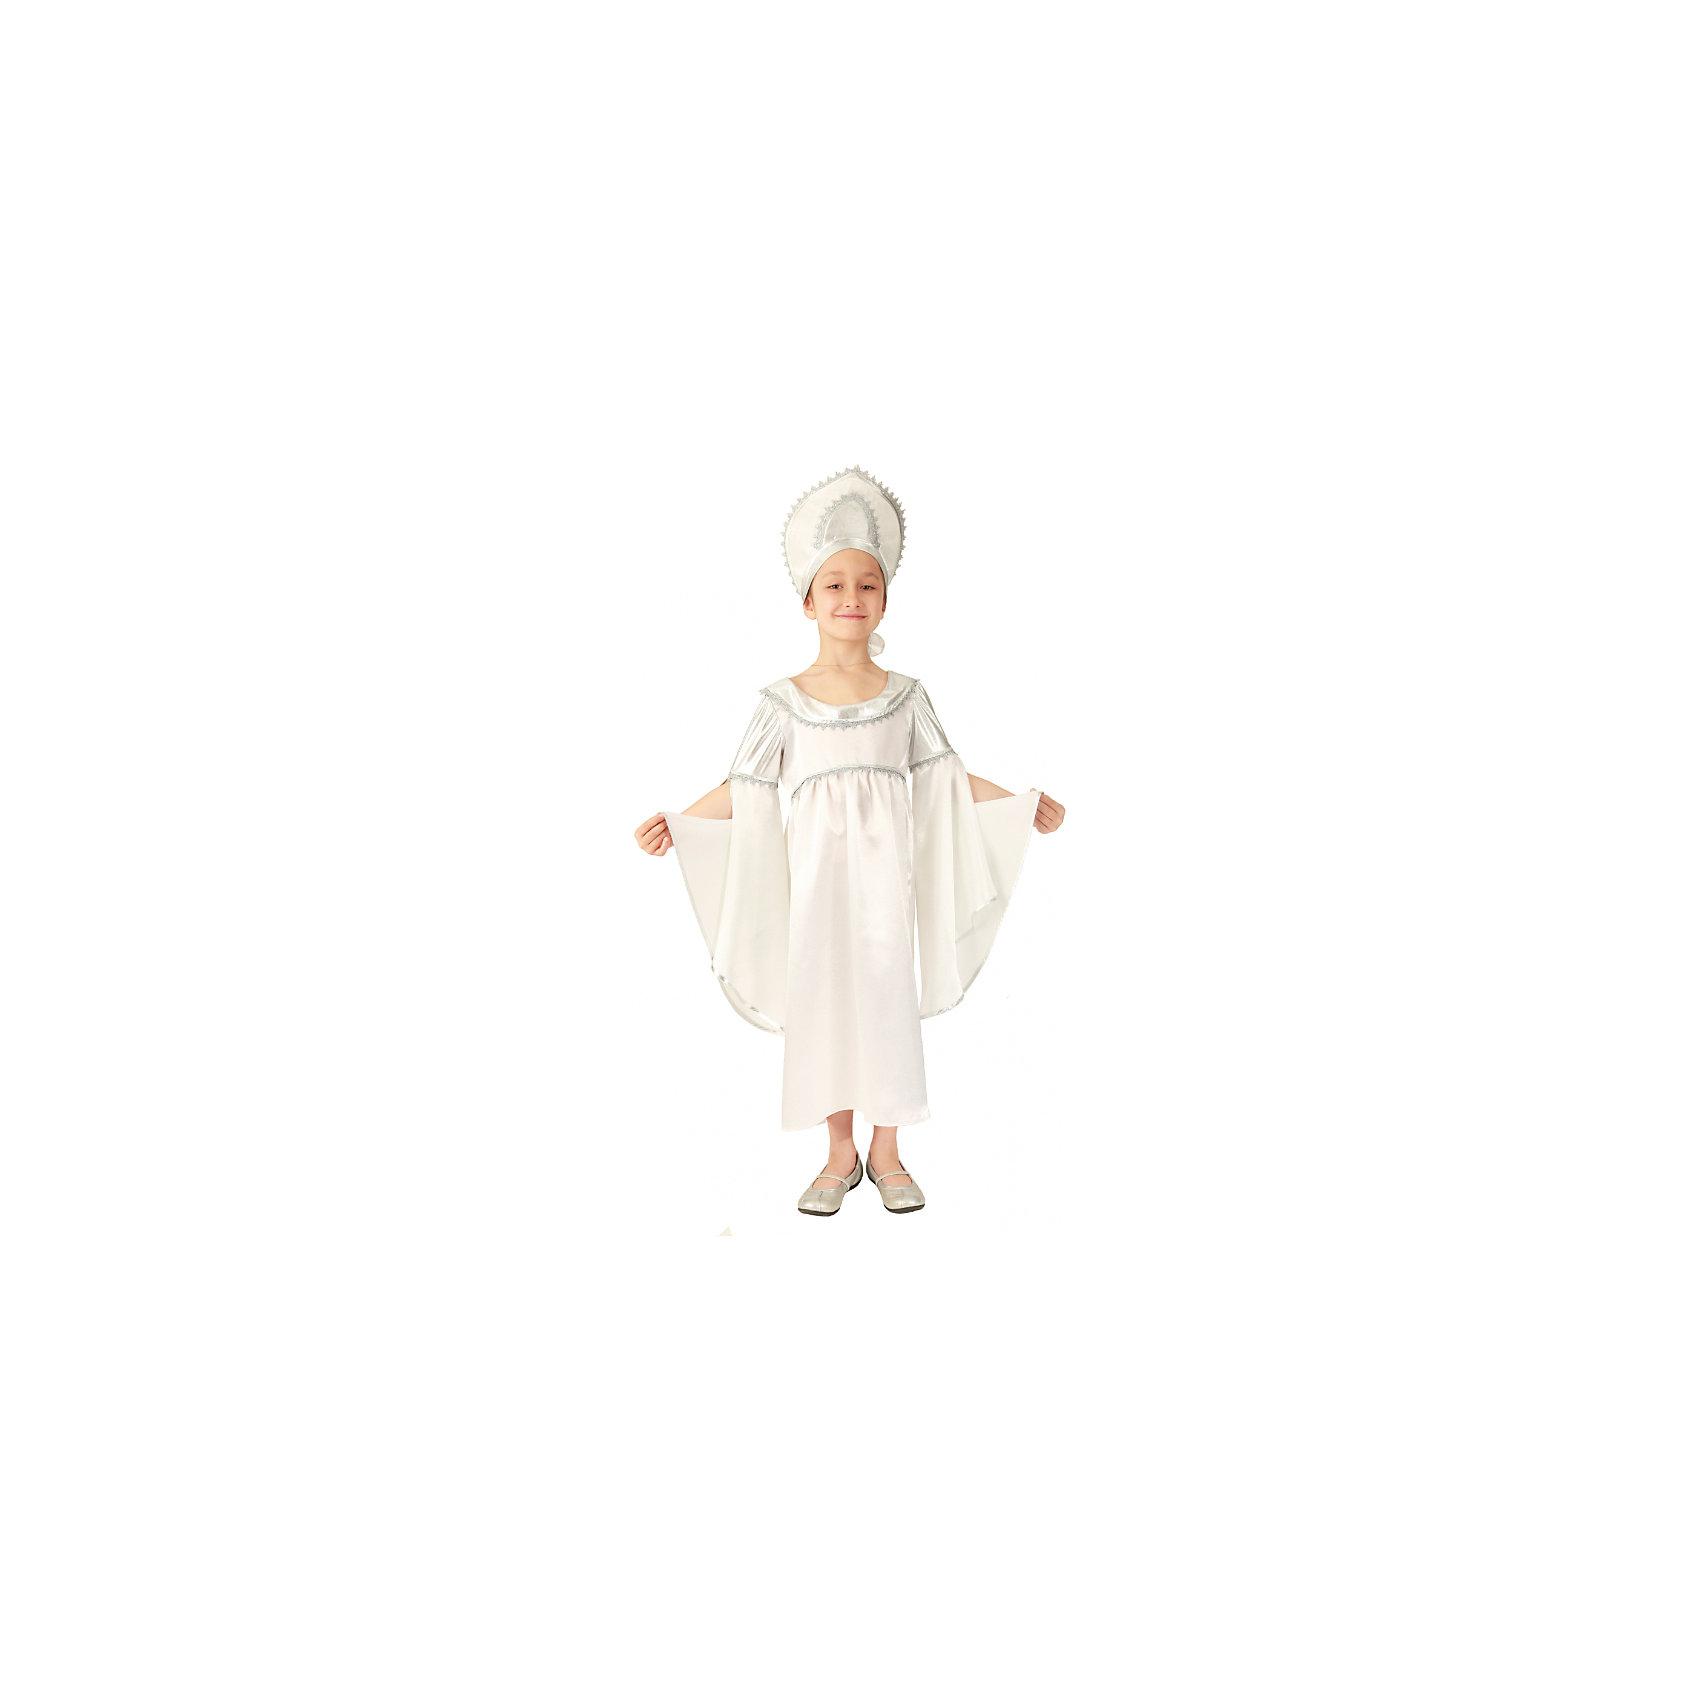 Вестифика Карнавальный костюм Метель, Вестифика вестифика карнавальный костюм цыпленок вестифика